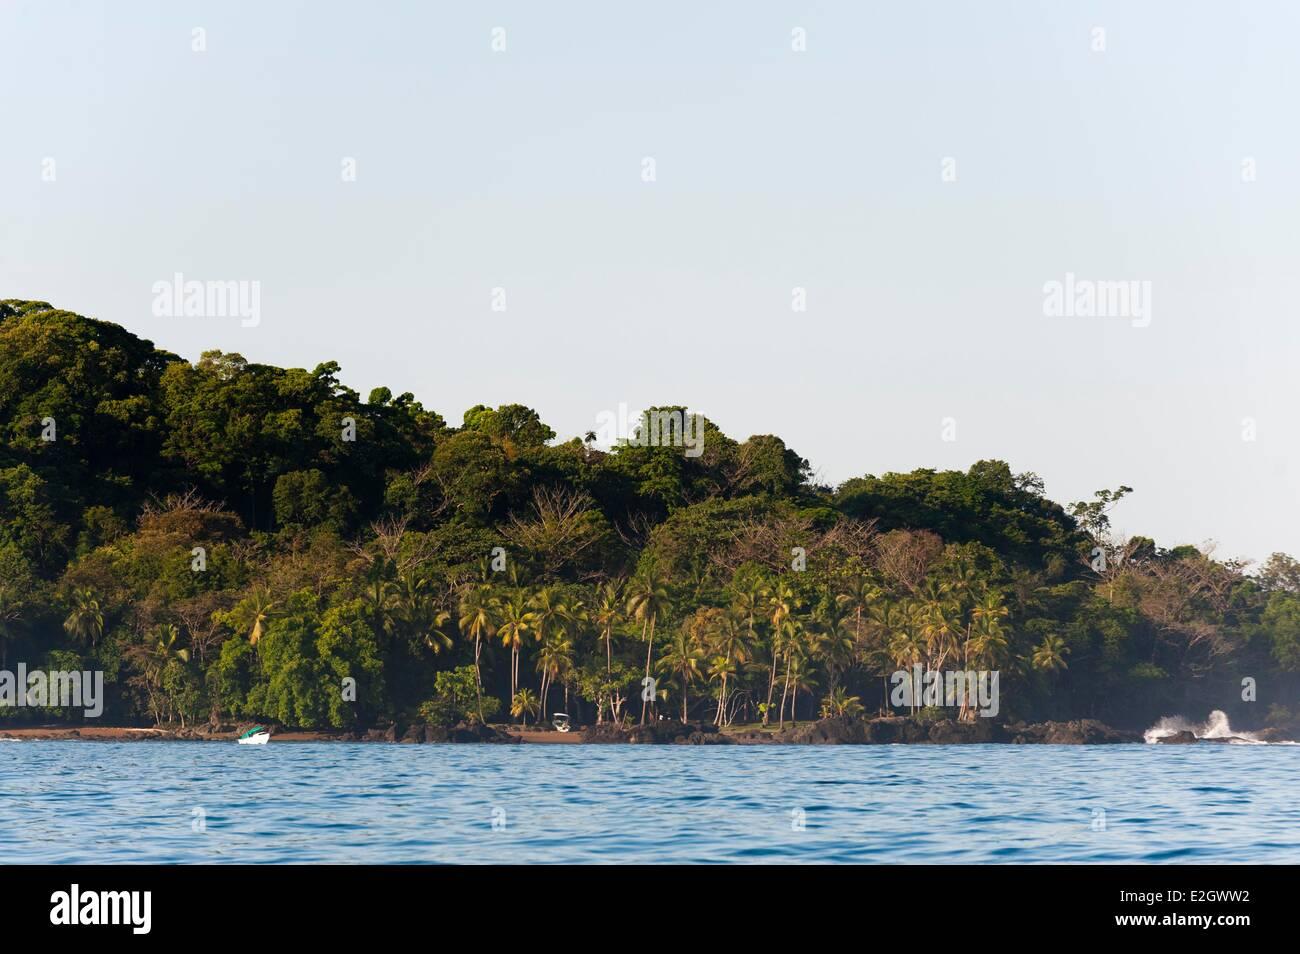 Costa Rica Osa peninsula Corcovado National Park - Stock Image